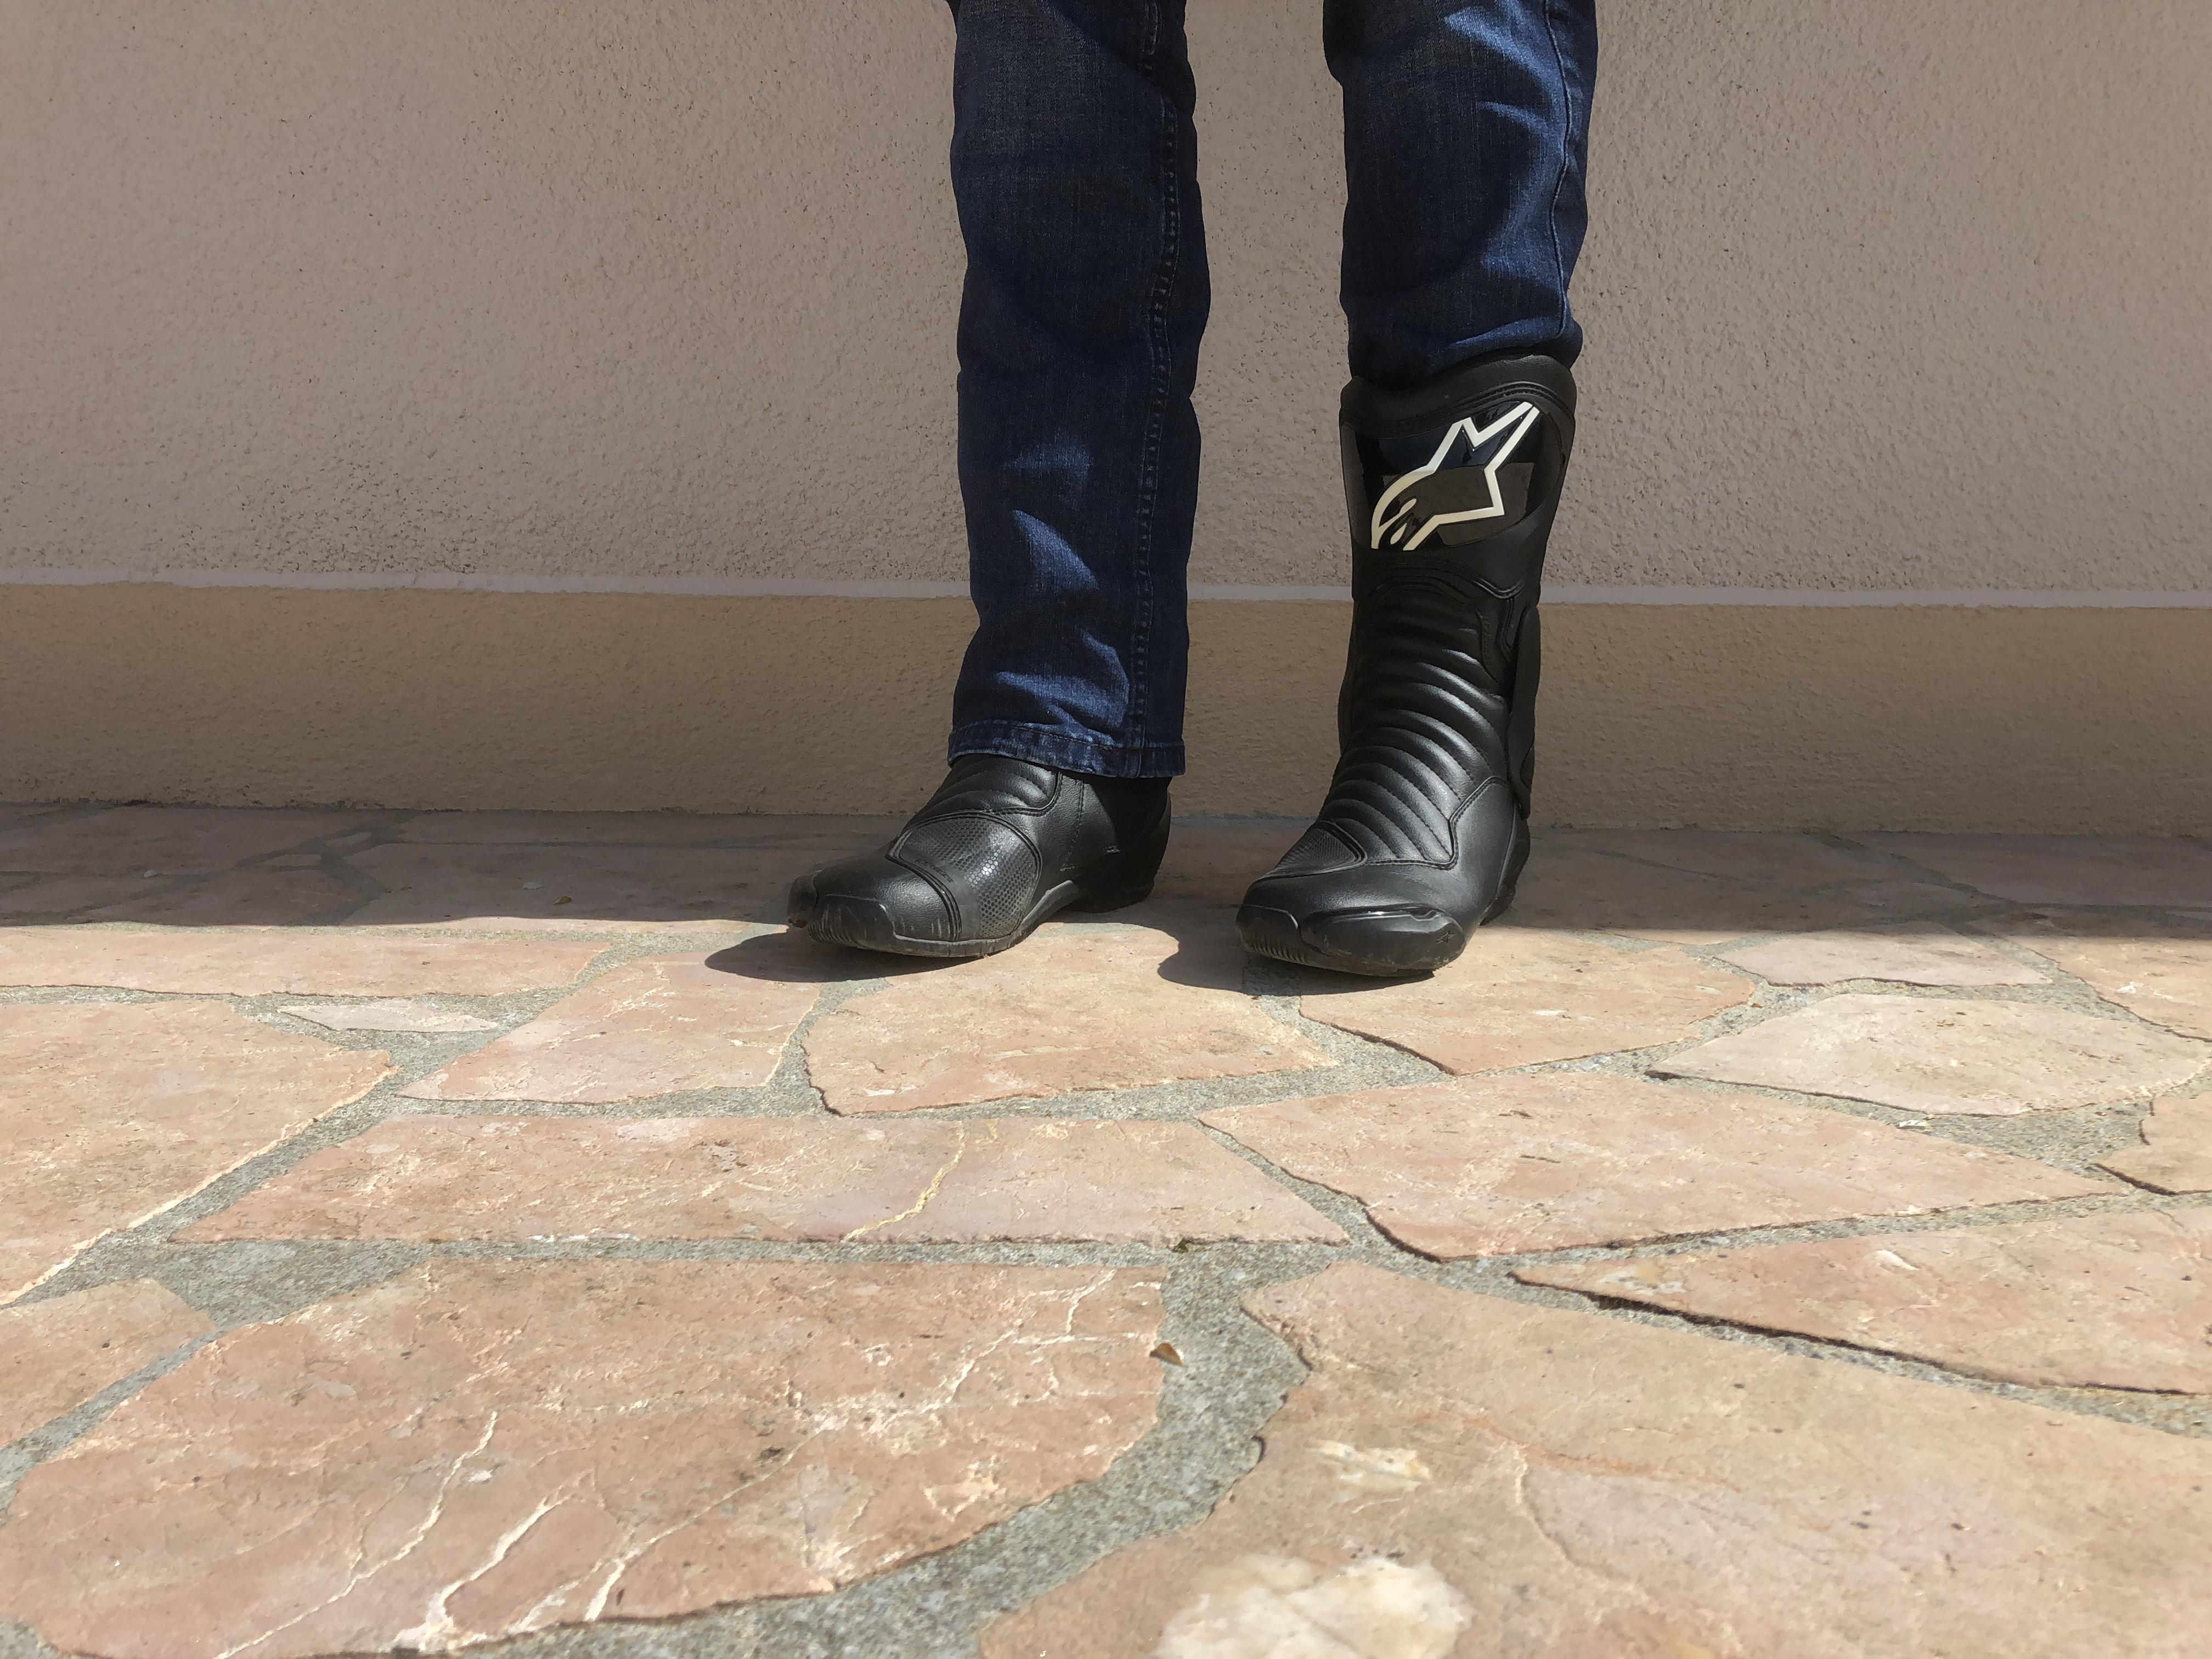 Bottes Alpinestars SMX 6 V2 avec jean